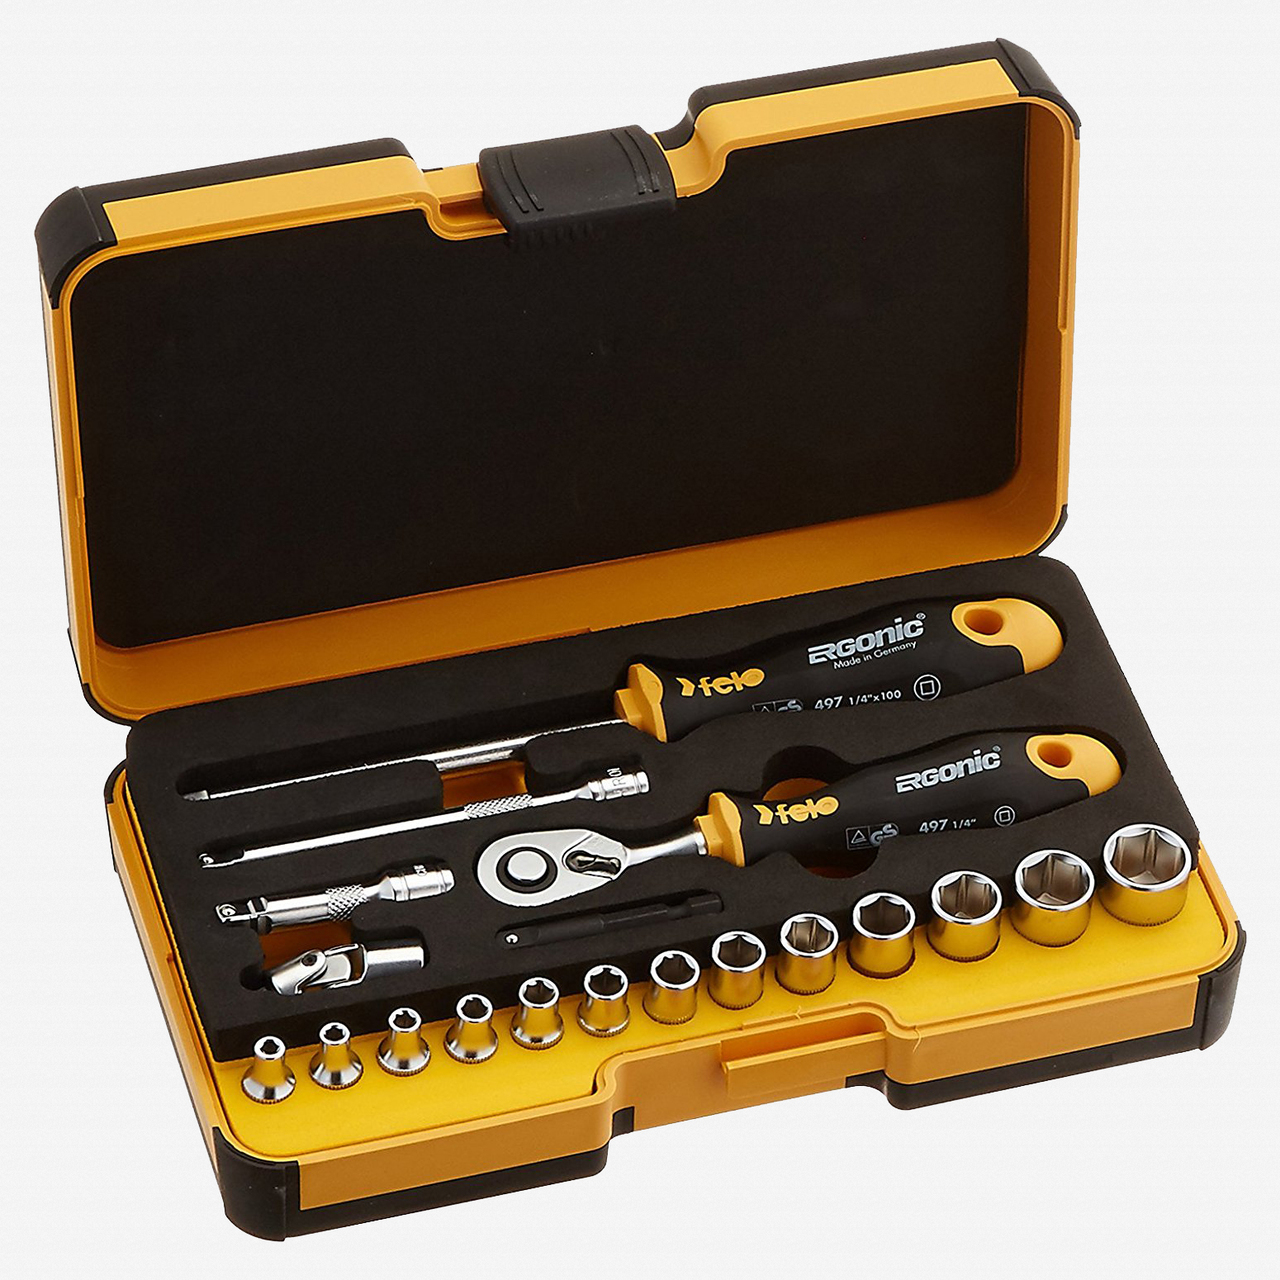 Felo 62055 R-GO 19 19pc Box Sockets, Ergonic Ratchet, INCH - KC Tool